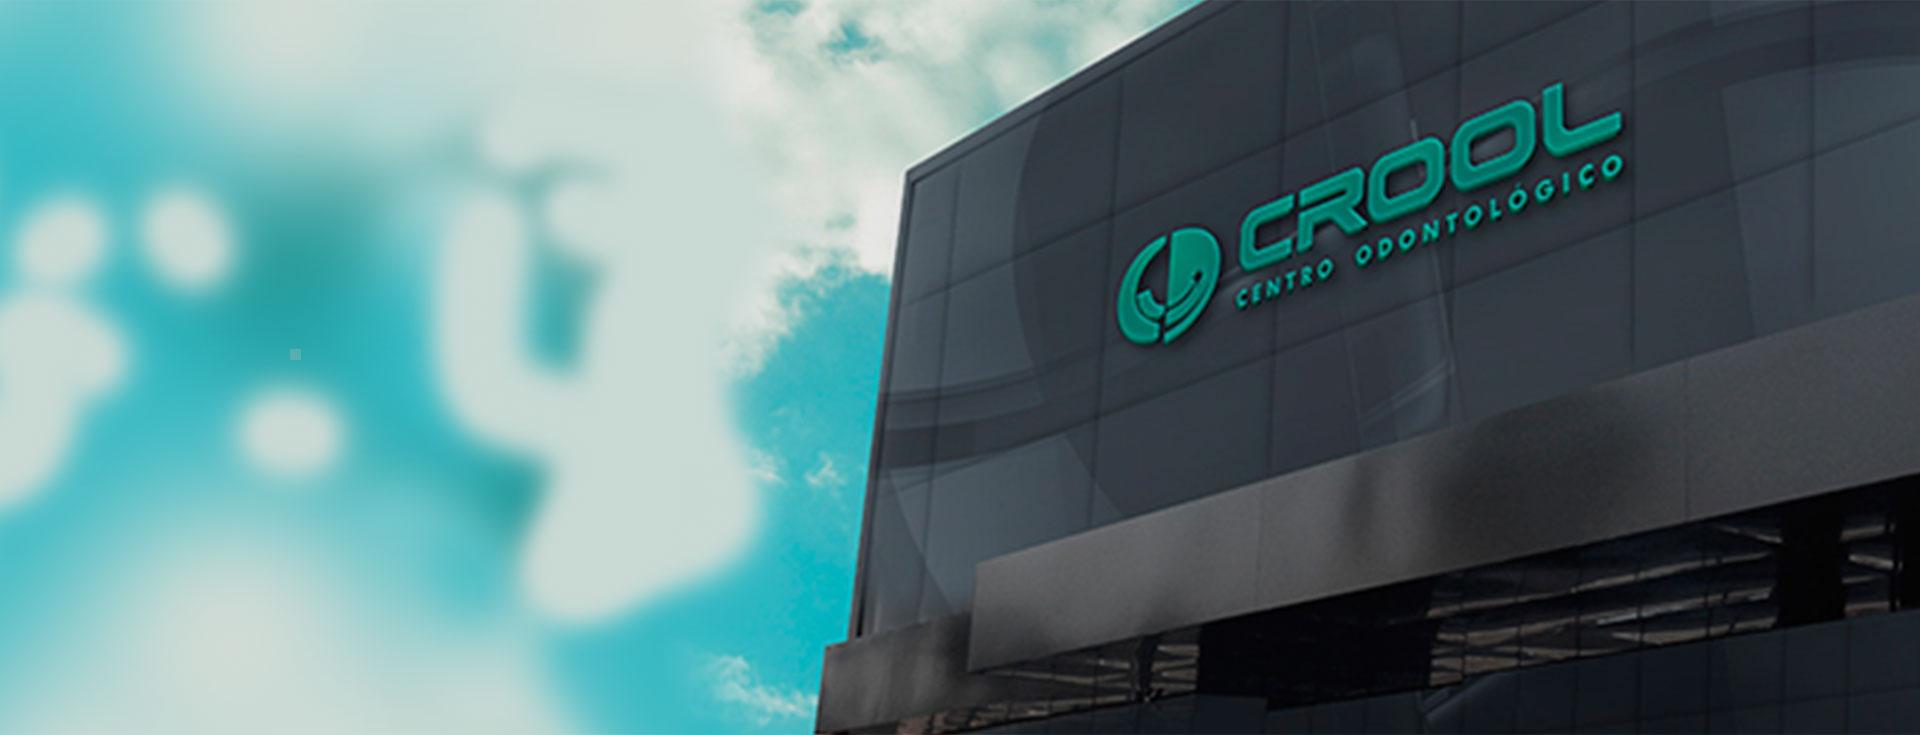 CROOL - Centro Odontológico - CROOL - Centro OdontológicoCROOL - Centro Odontológico | CROOL – Centro Odontológico